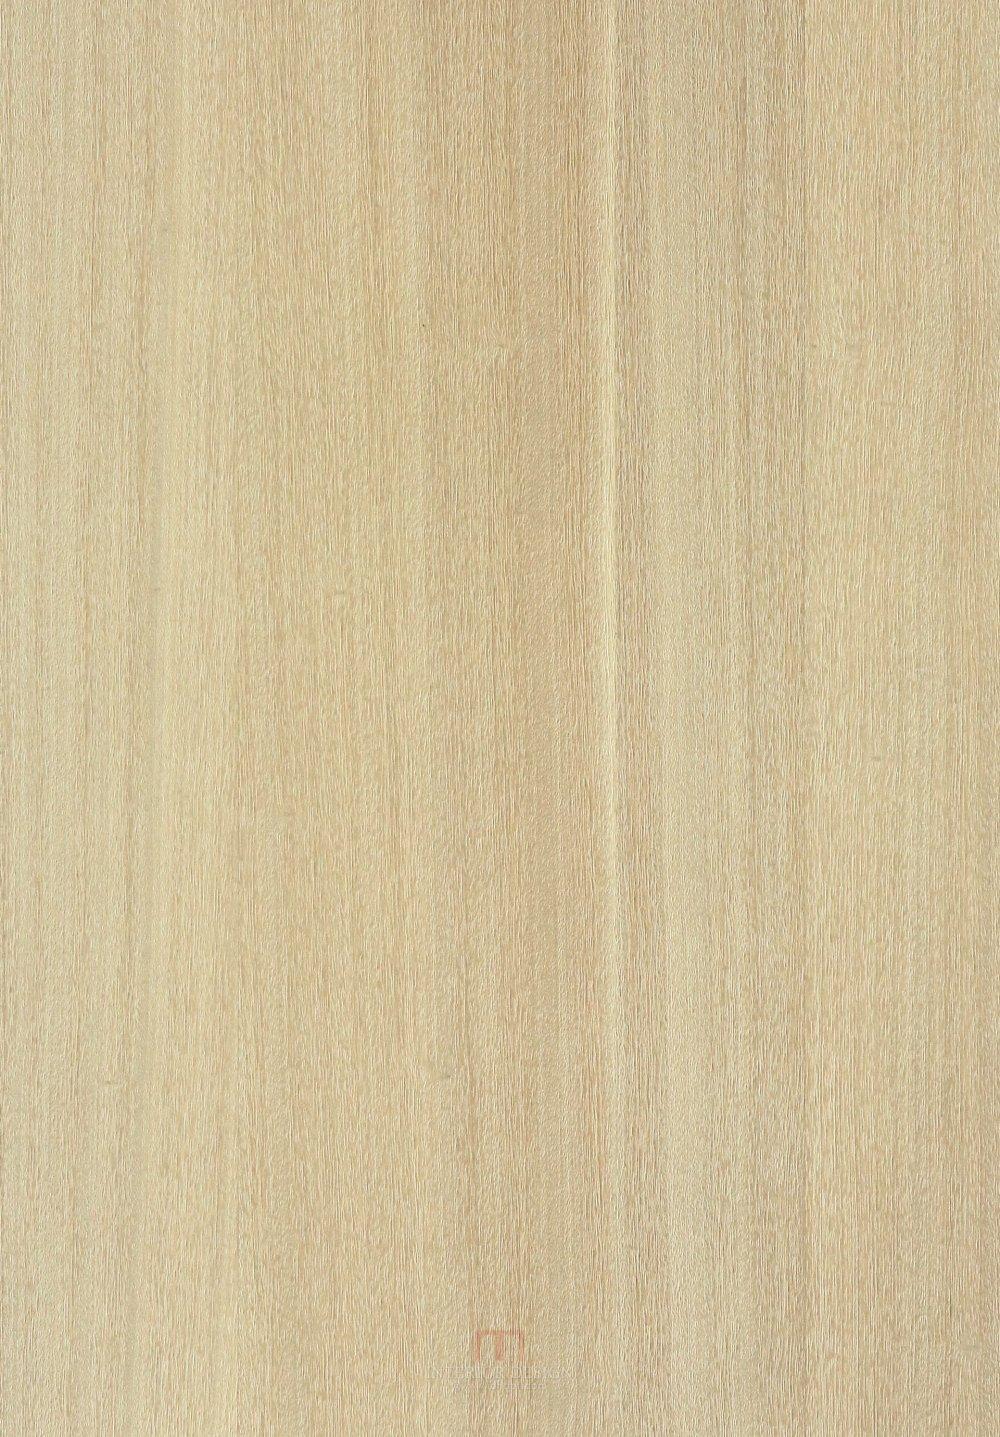 K6125CN_沙比利噴砂自然拼.JPG